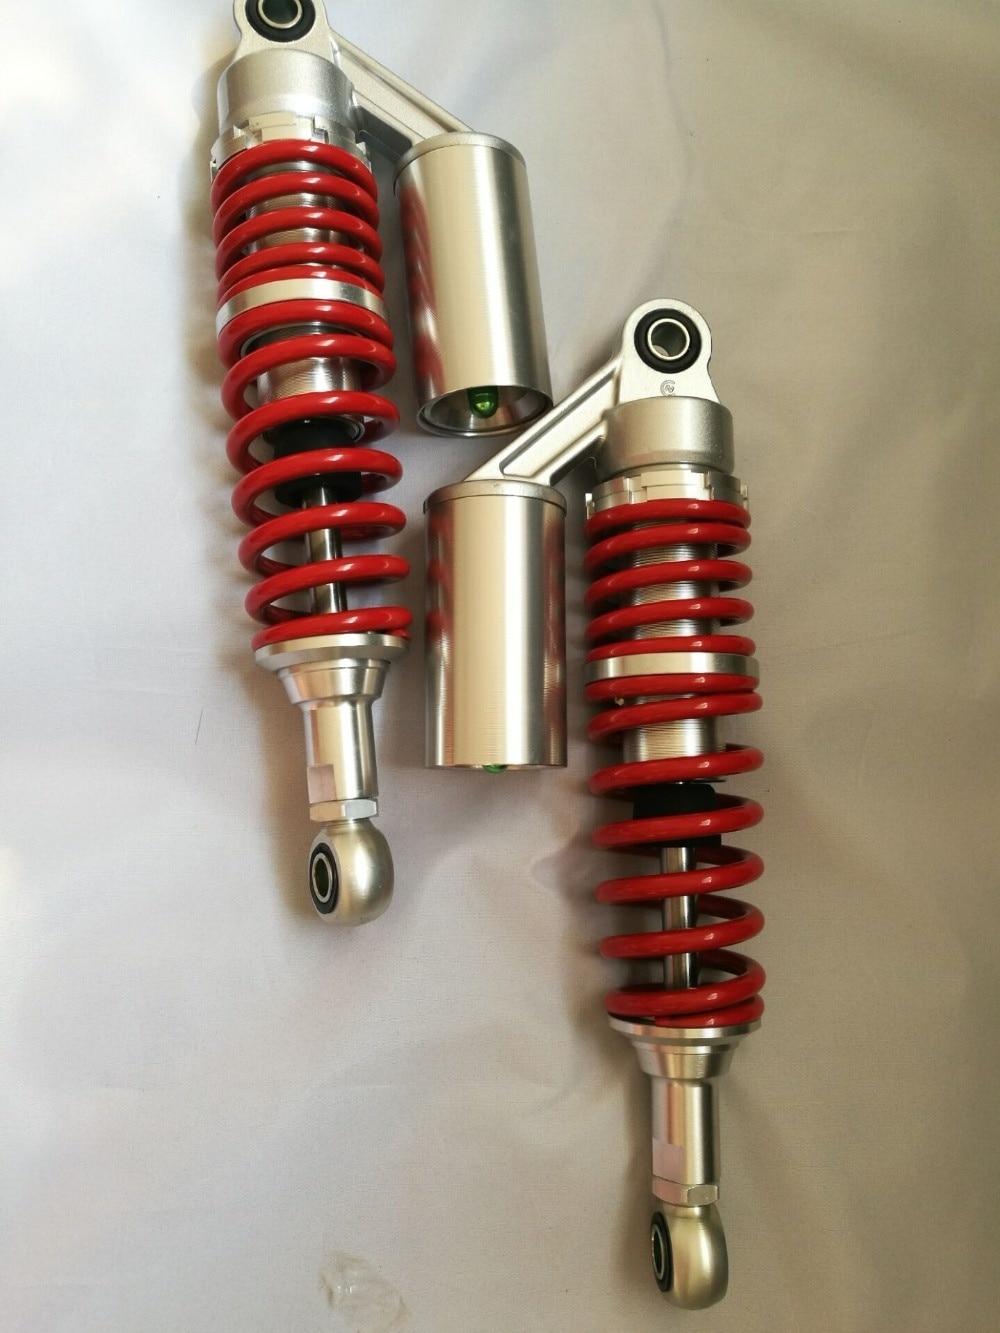 Задний Амортизатор для подвески Suziki мотоцикл аксессуары